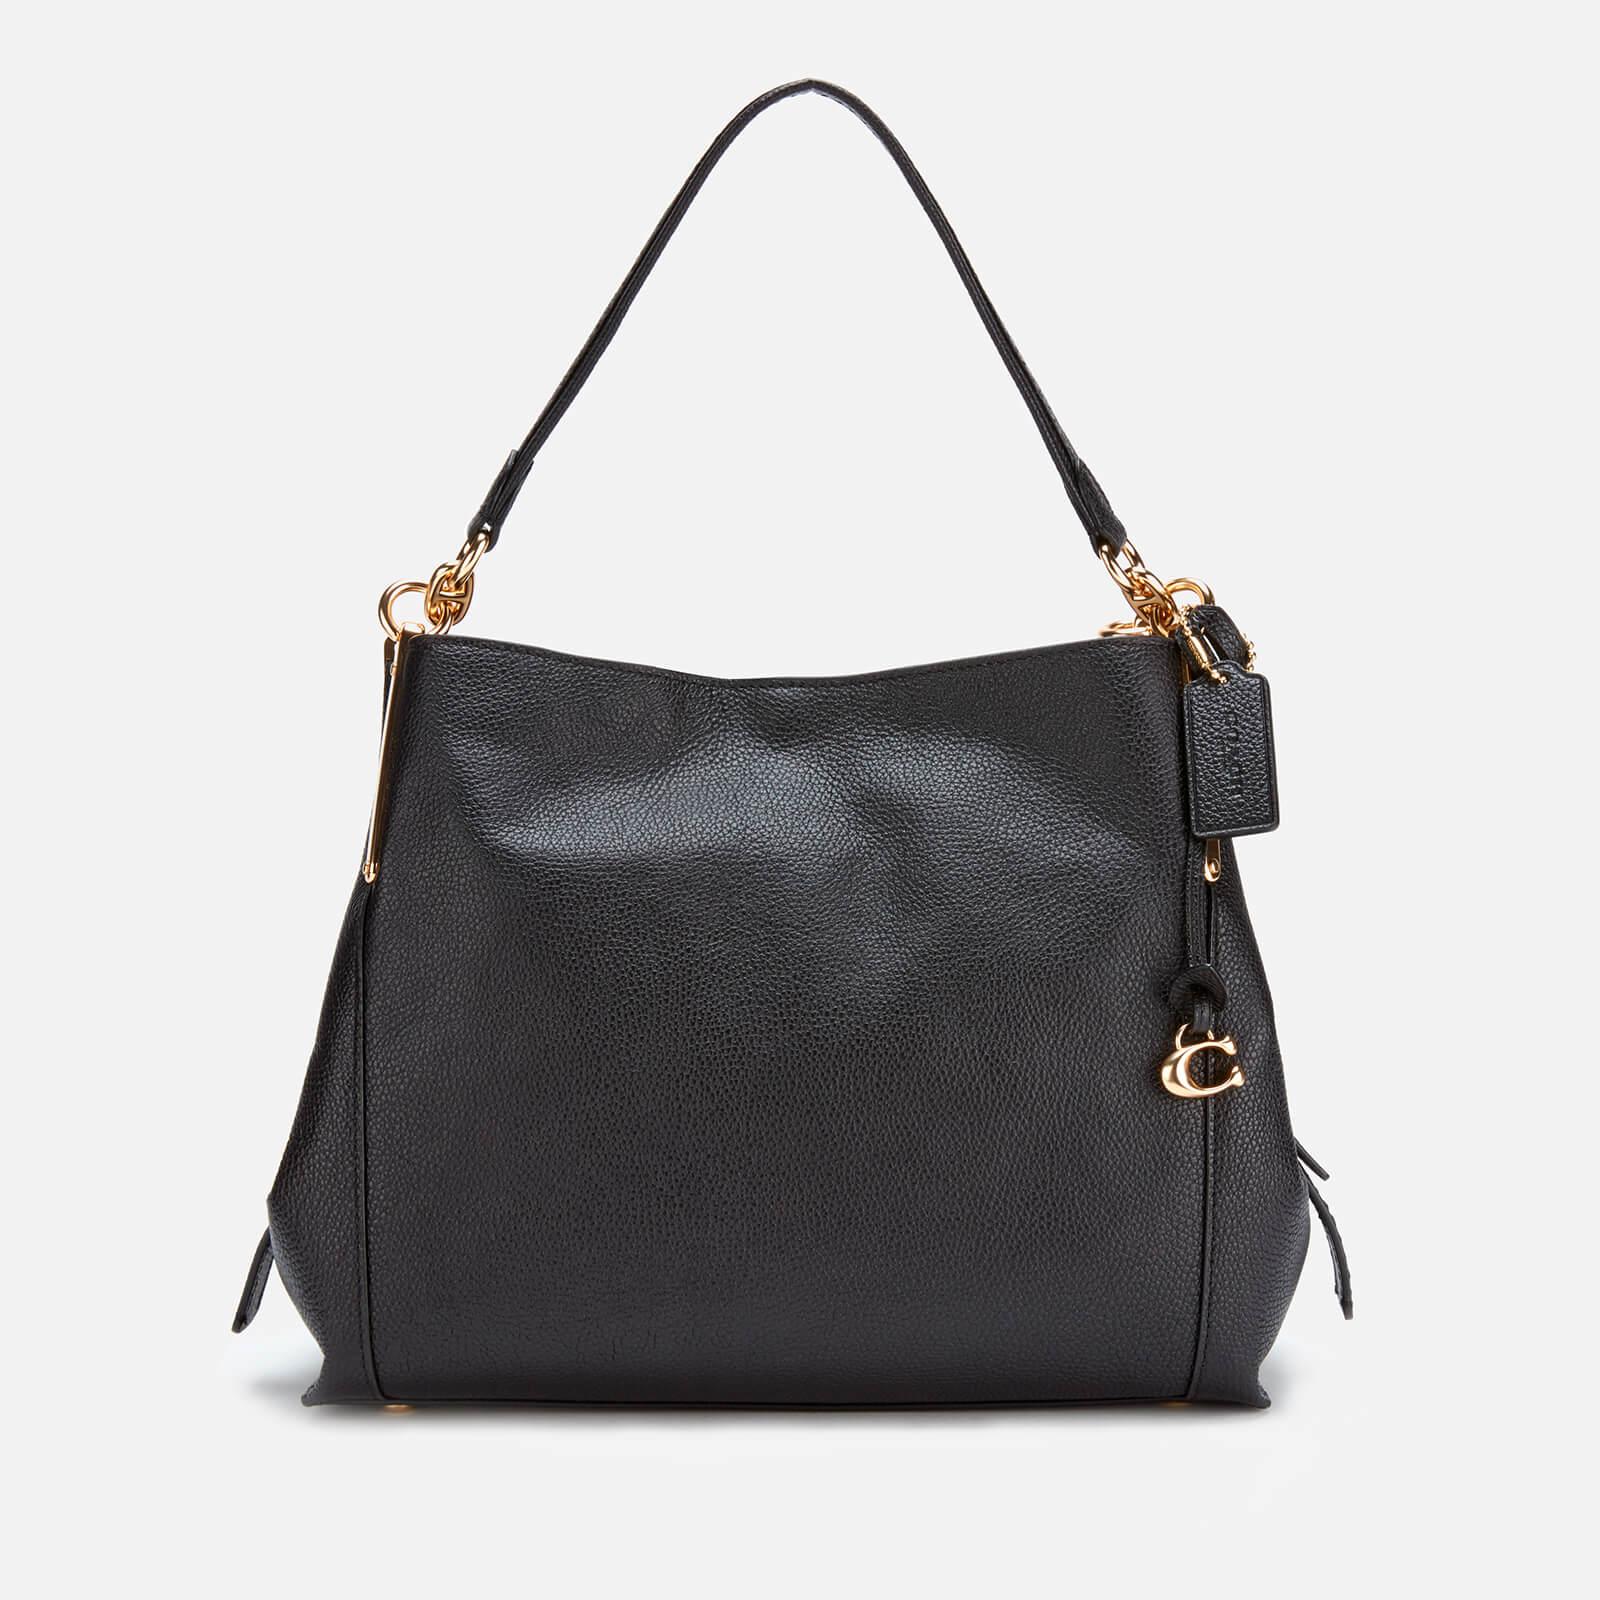 795035dab2 Coach Women's Polished Pebble Leather Dalton 28 Shoulder Bag - Black